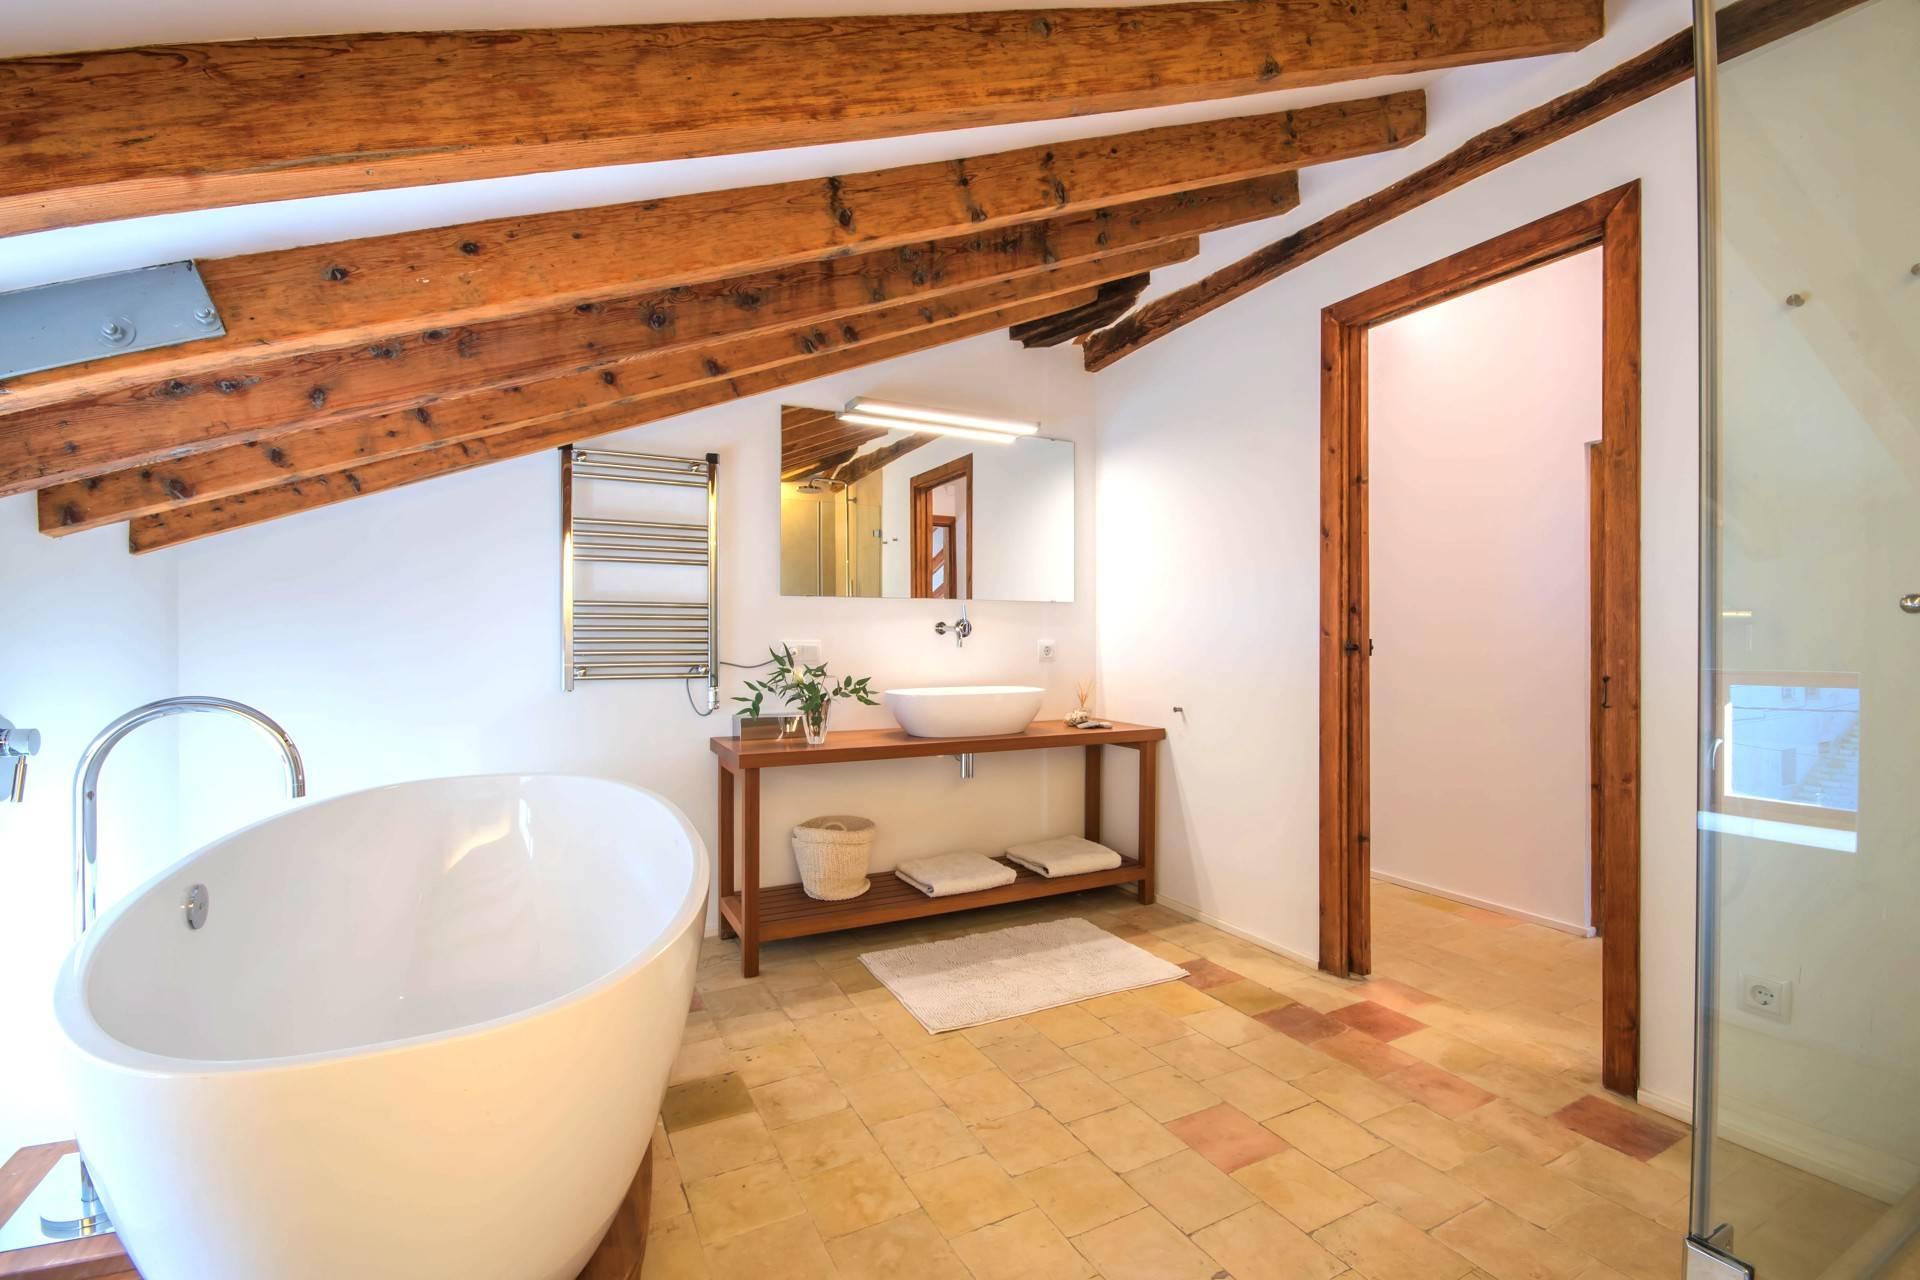 01-257 Luxus Ferienhaus Mallorca Südwesten Bild 24